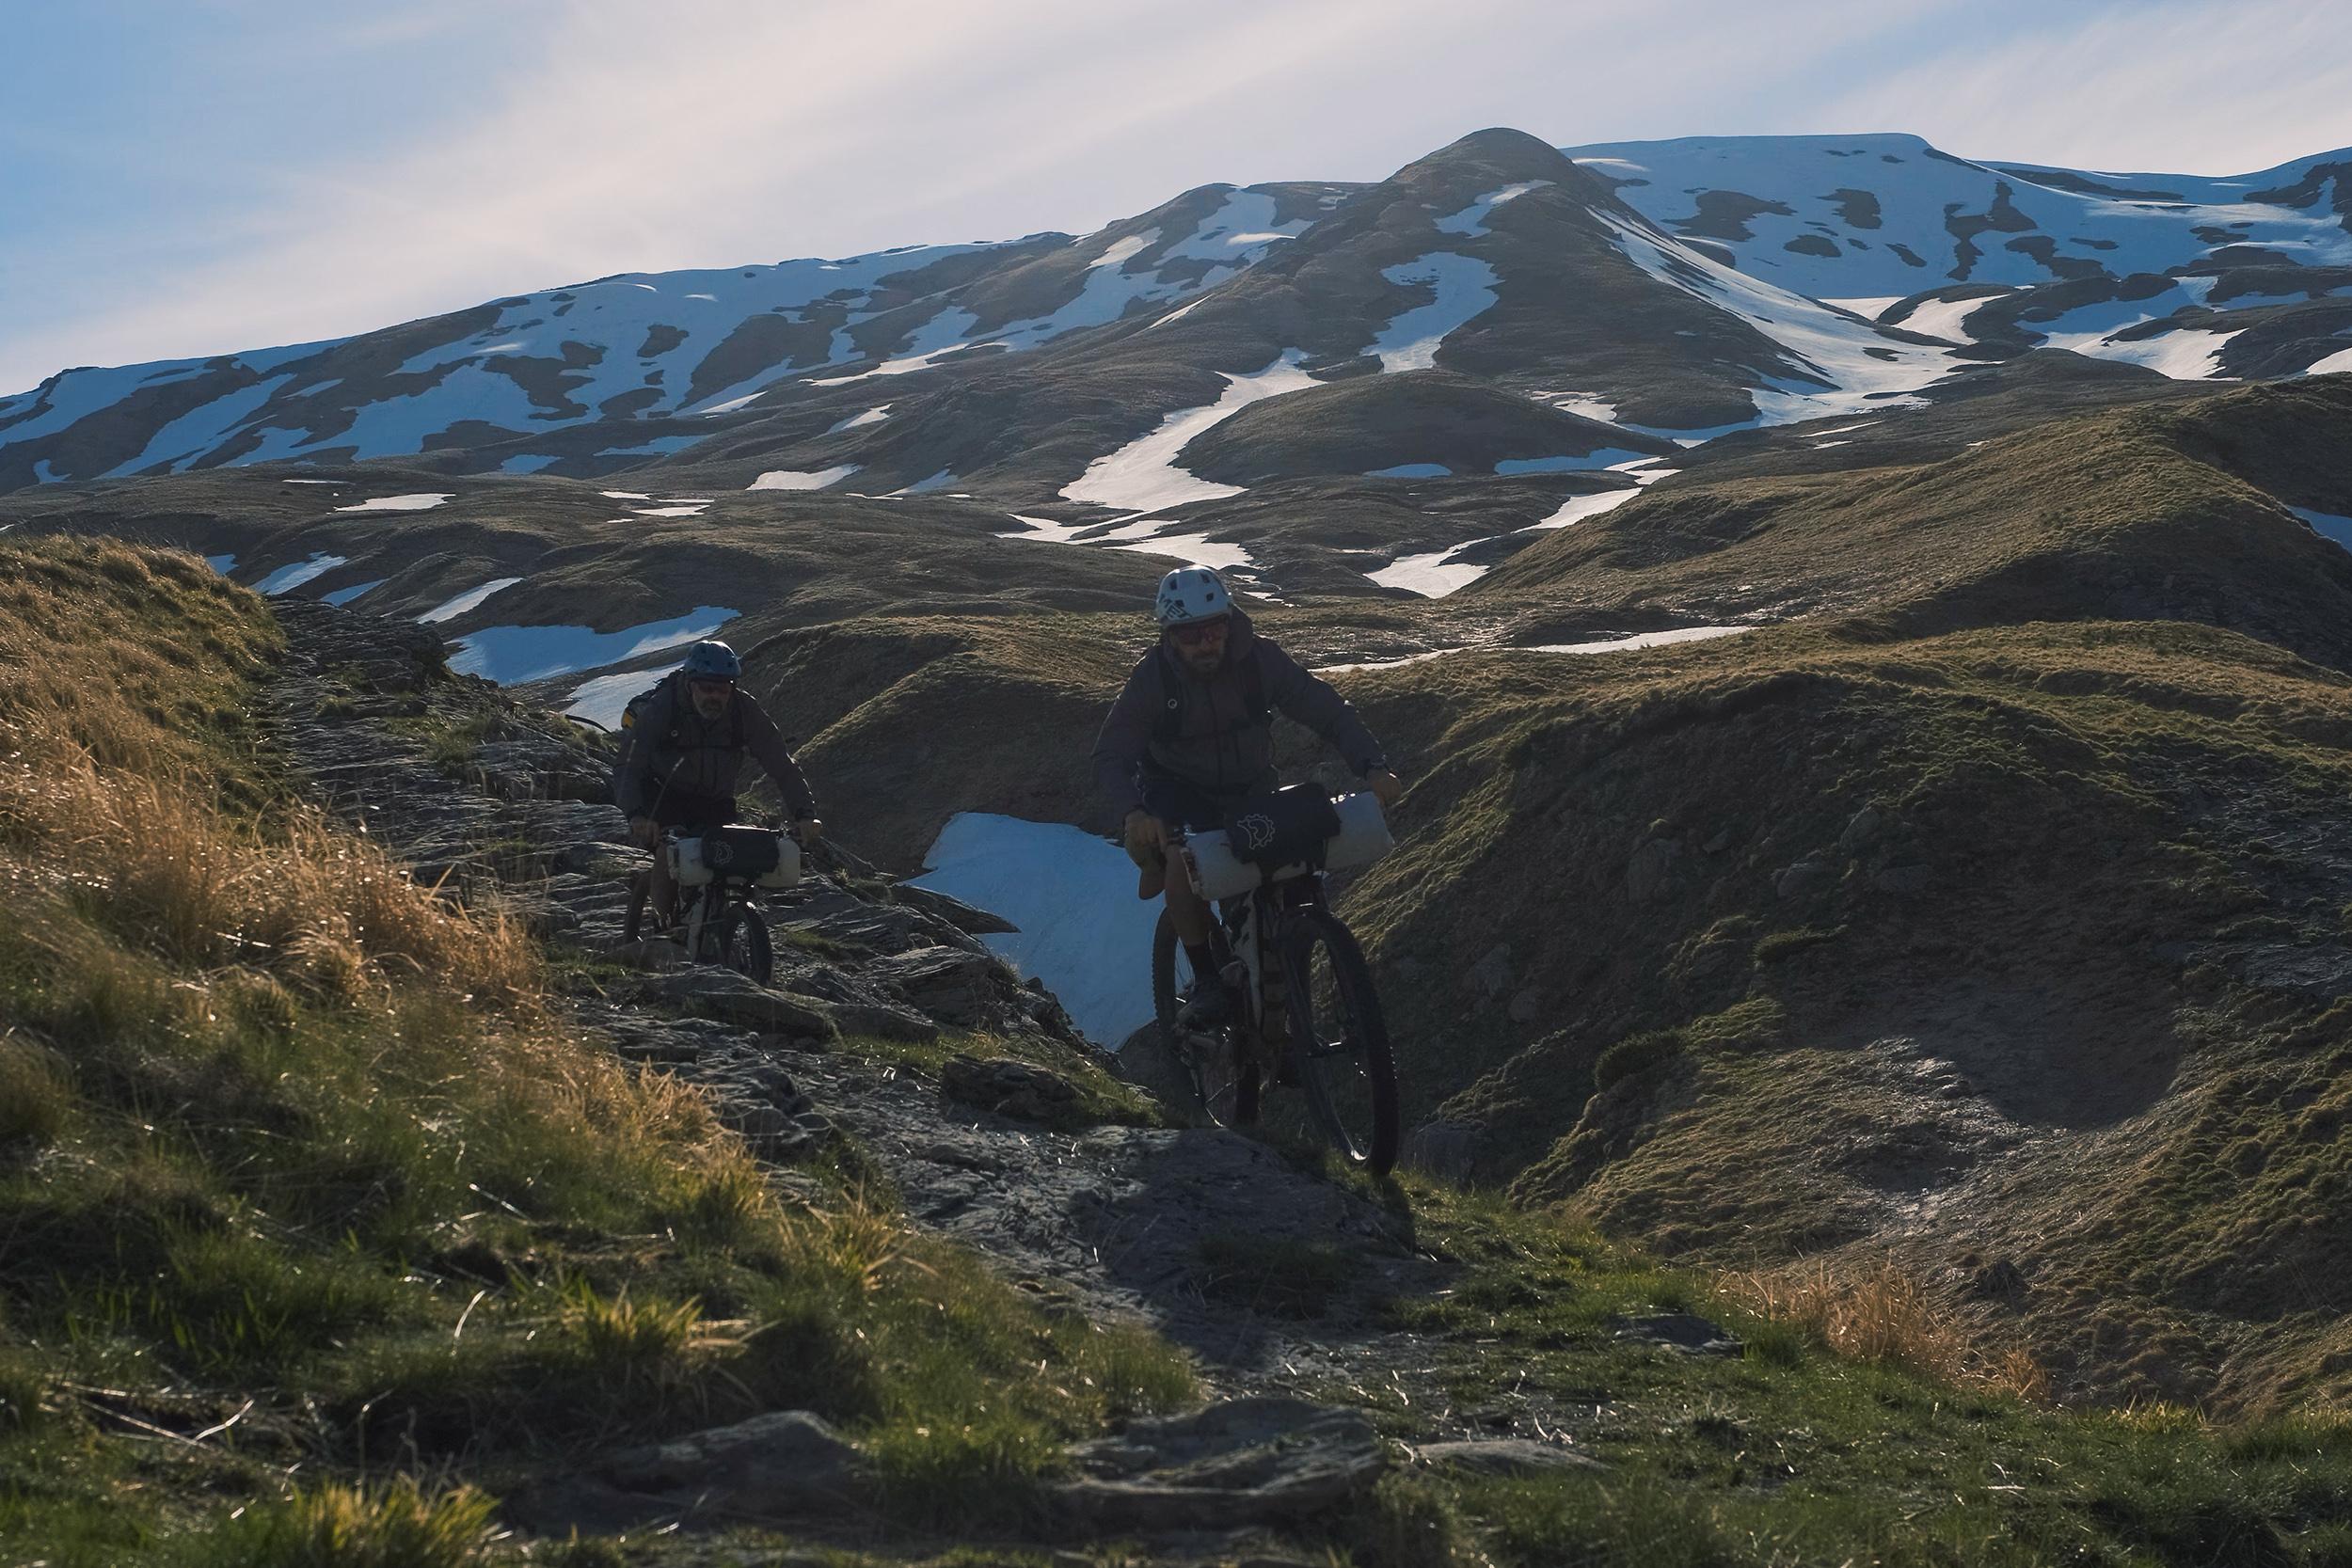 two guys mountain biking along singletrack trail in Italy on a high peak